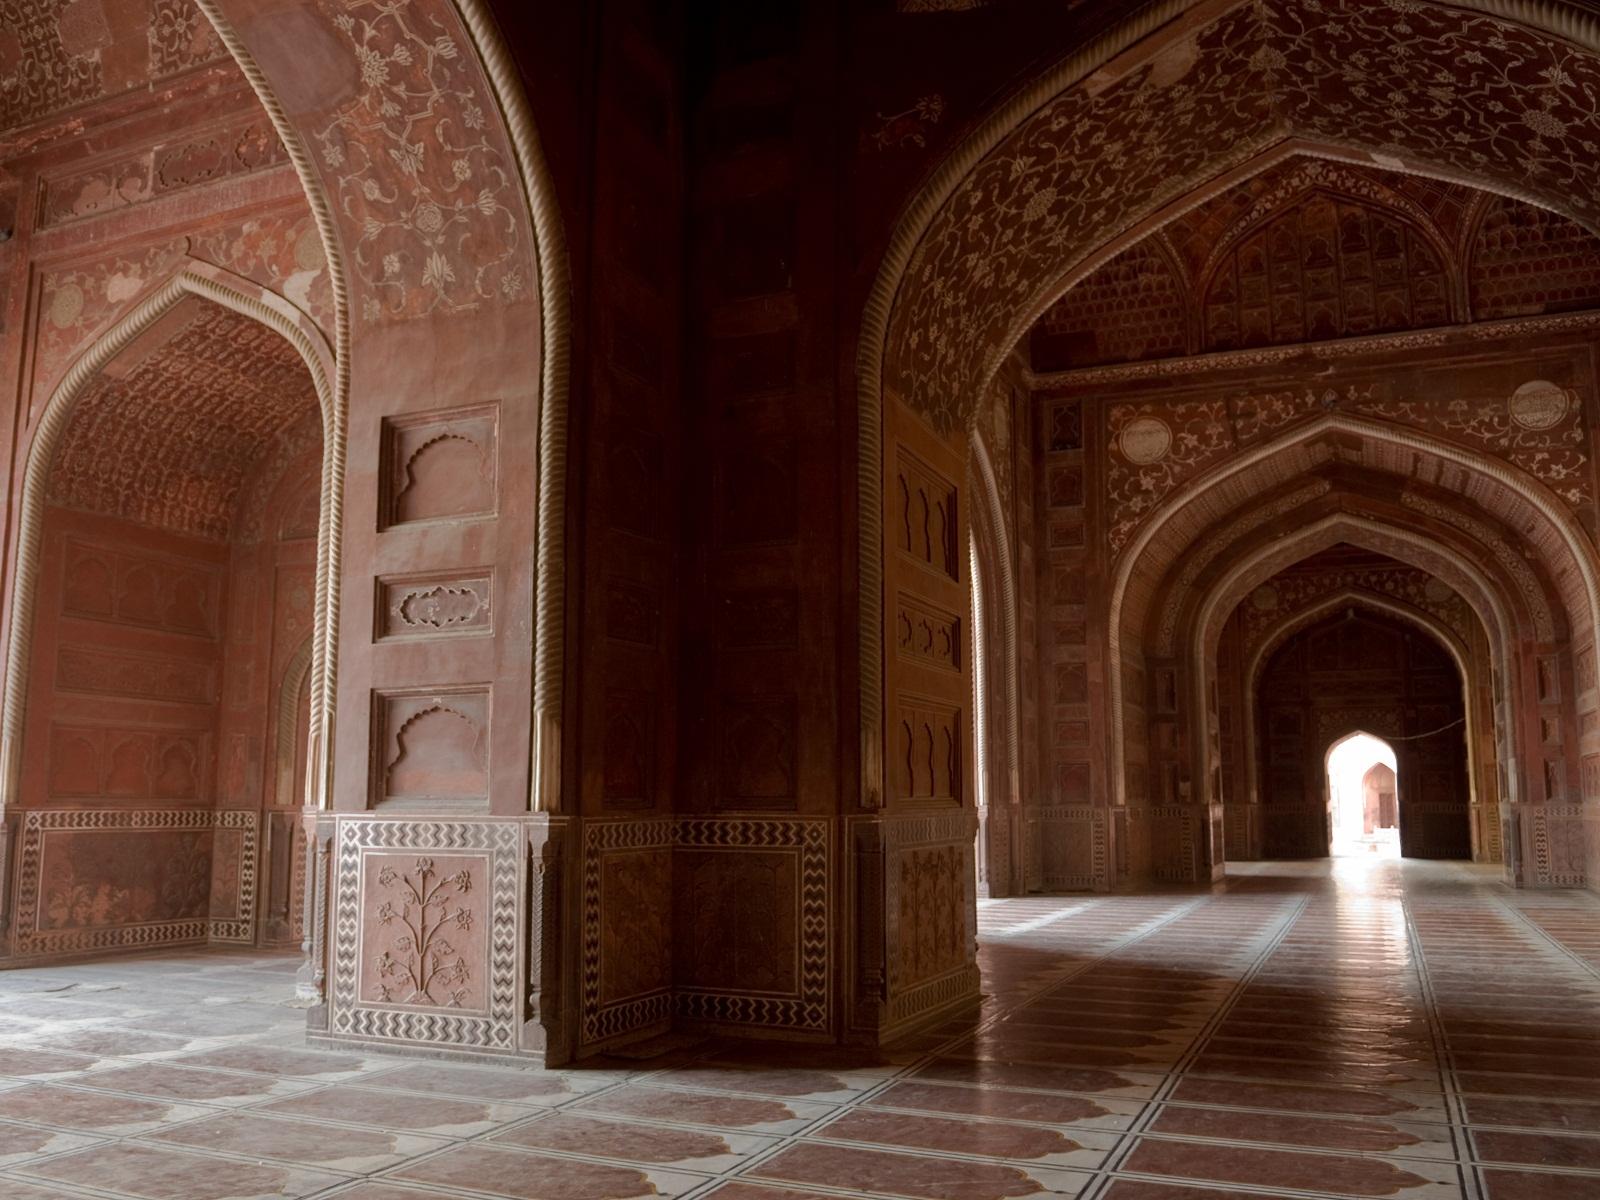 India del norte templo taj mahal taringa for Interior taj mahal